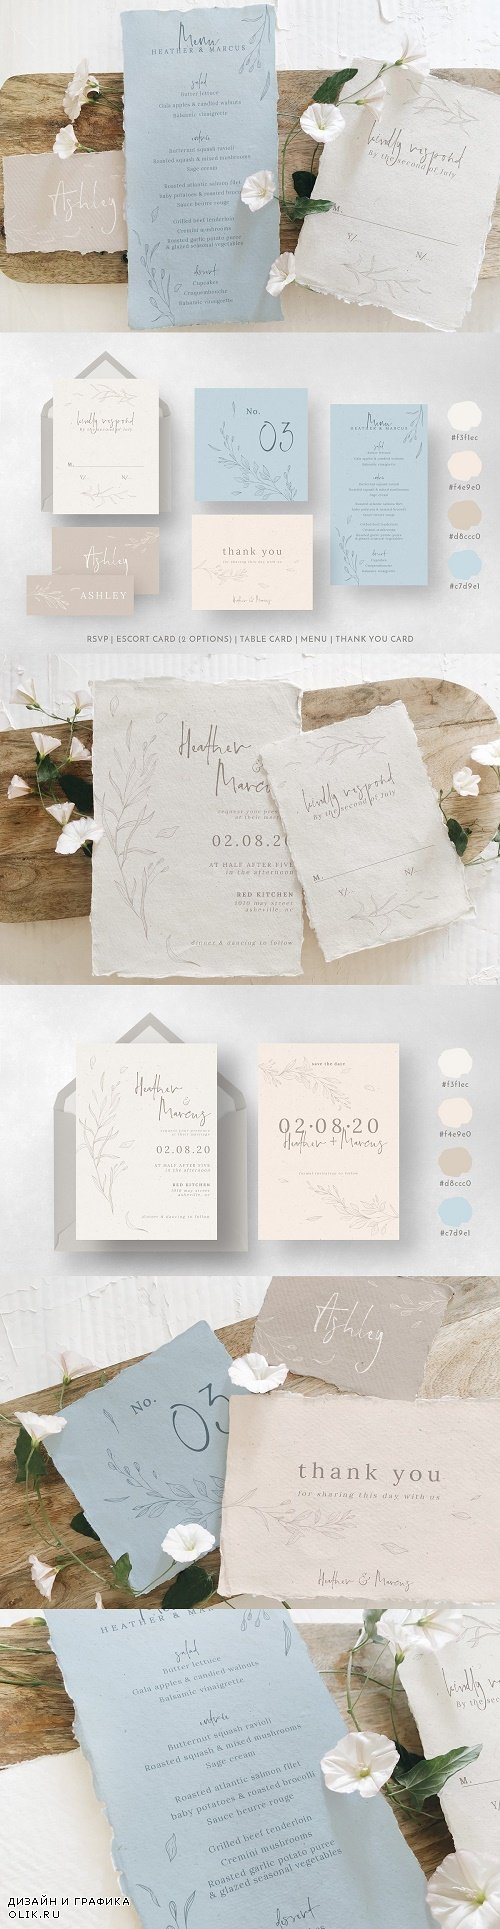 Rustic Ivory & Blue Wedding Suite - 3849807